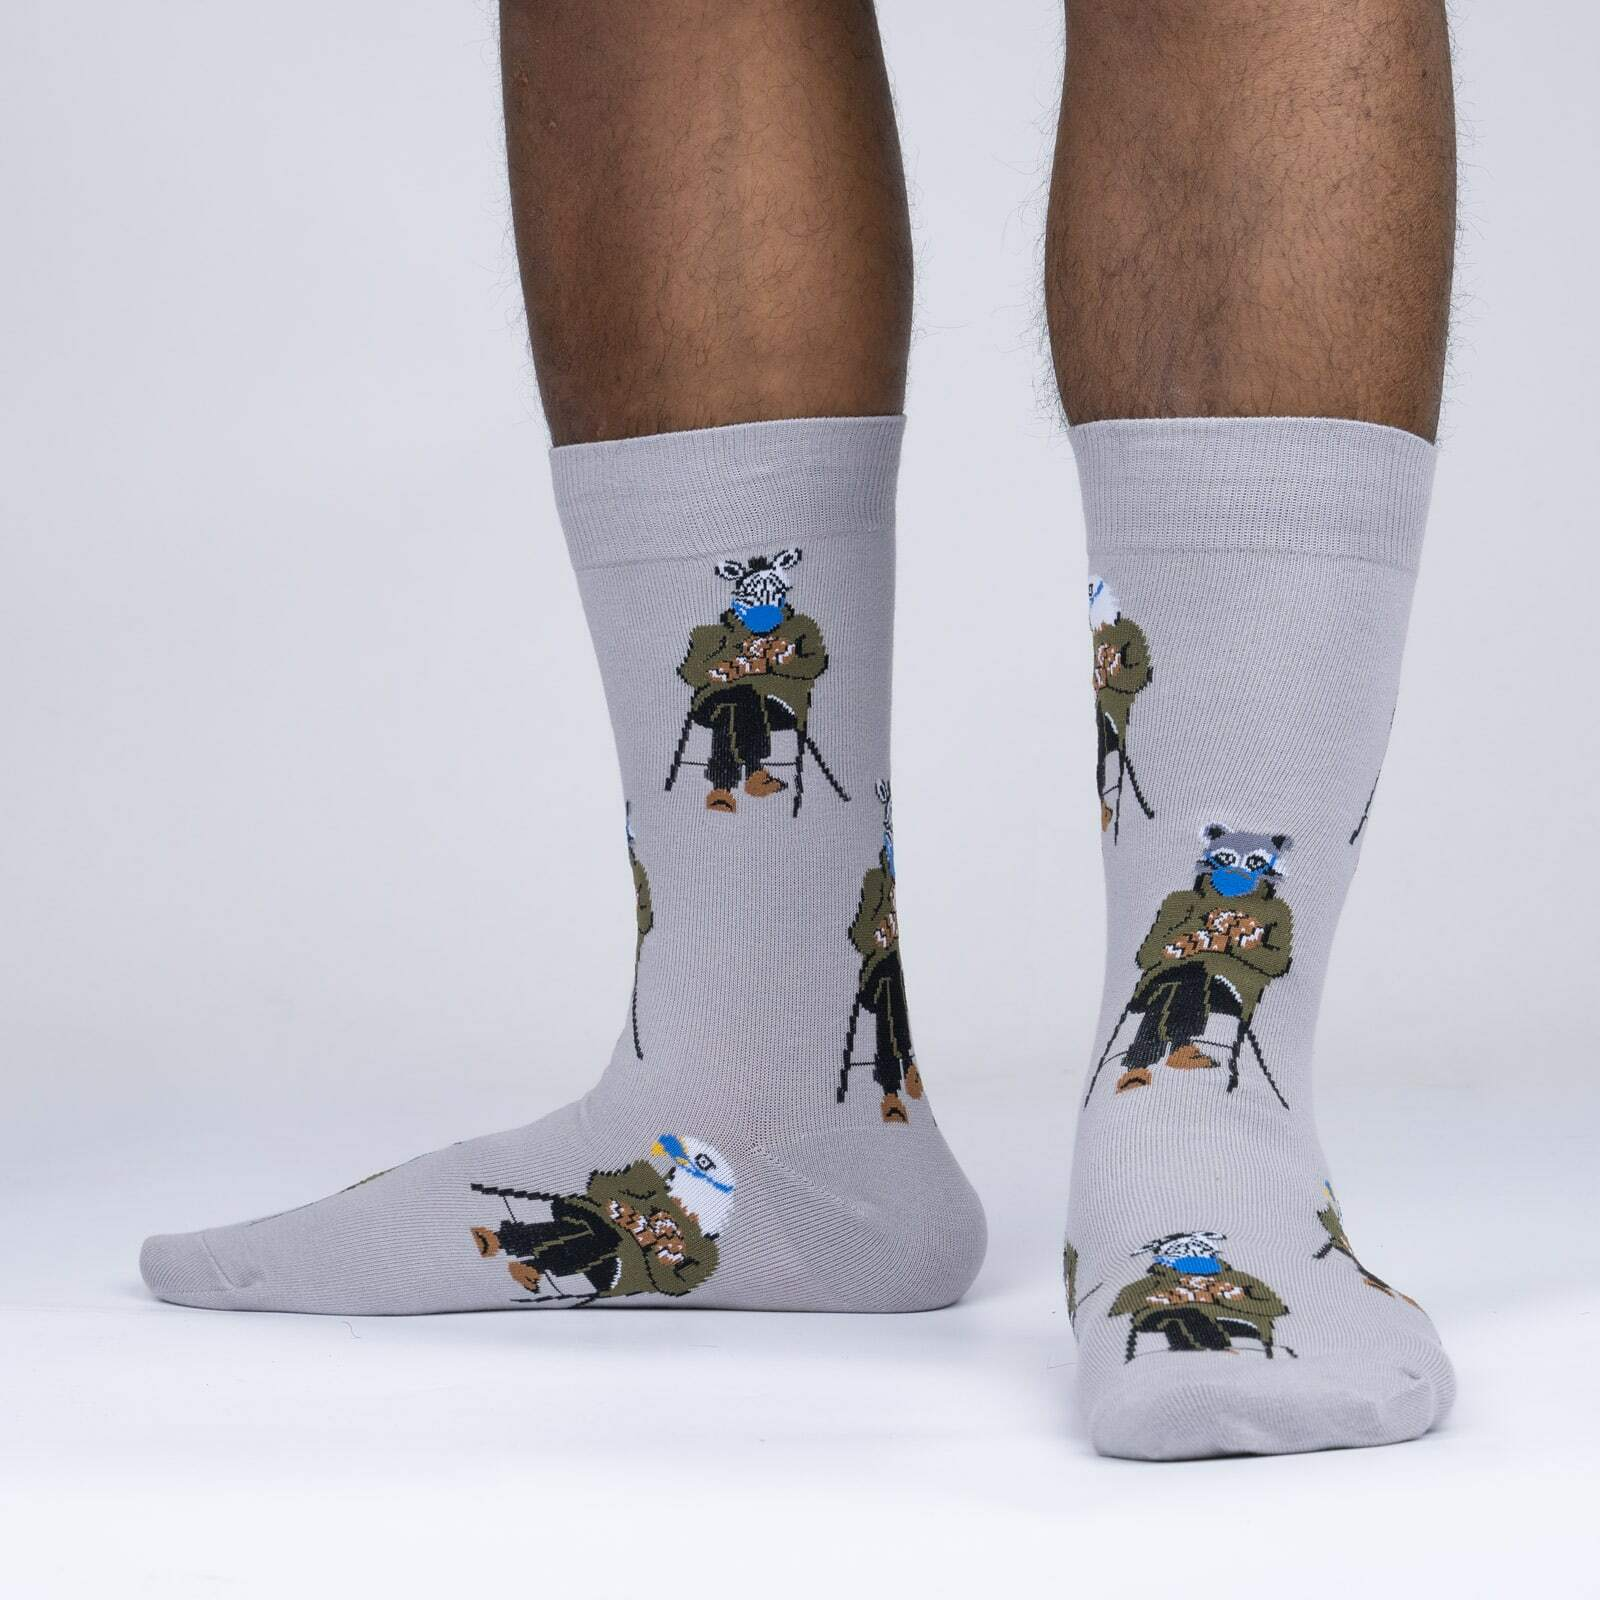 model side view of Made in Vermont - Bernie Sanders Socks - Men's